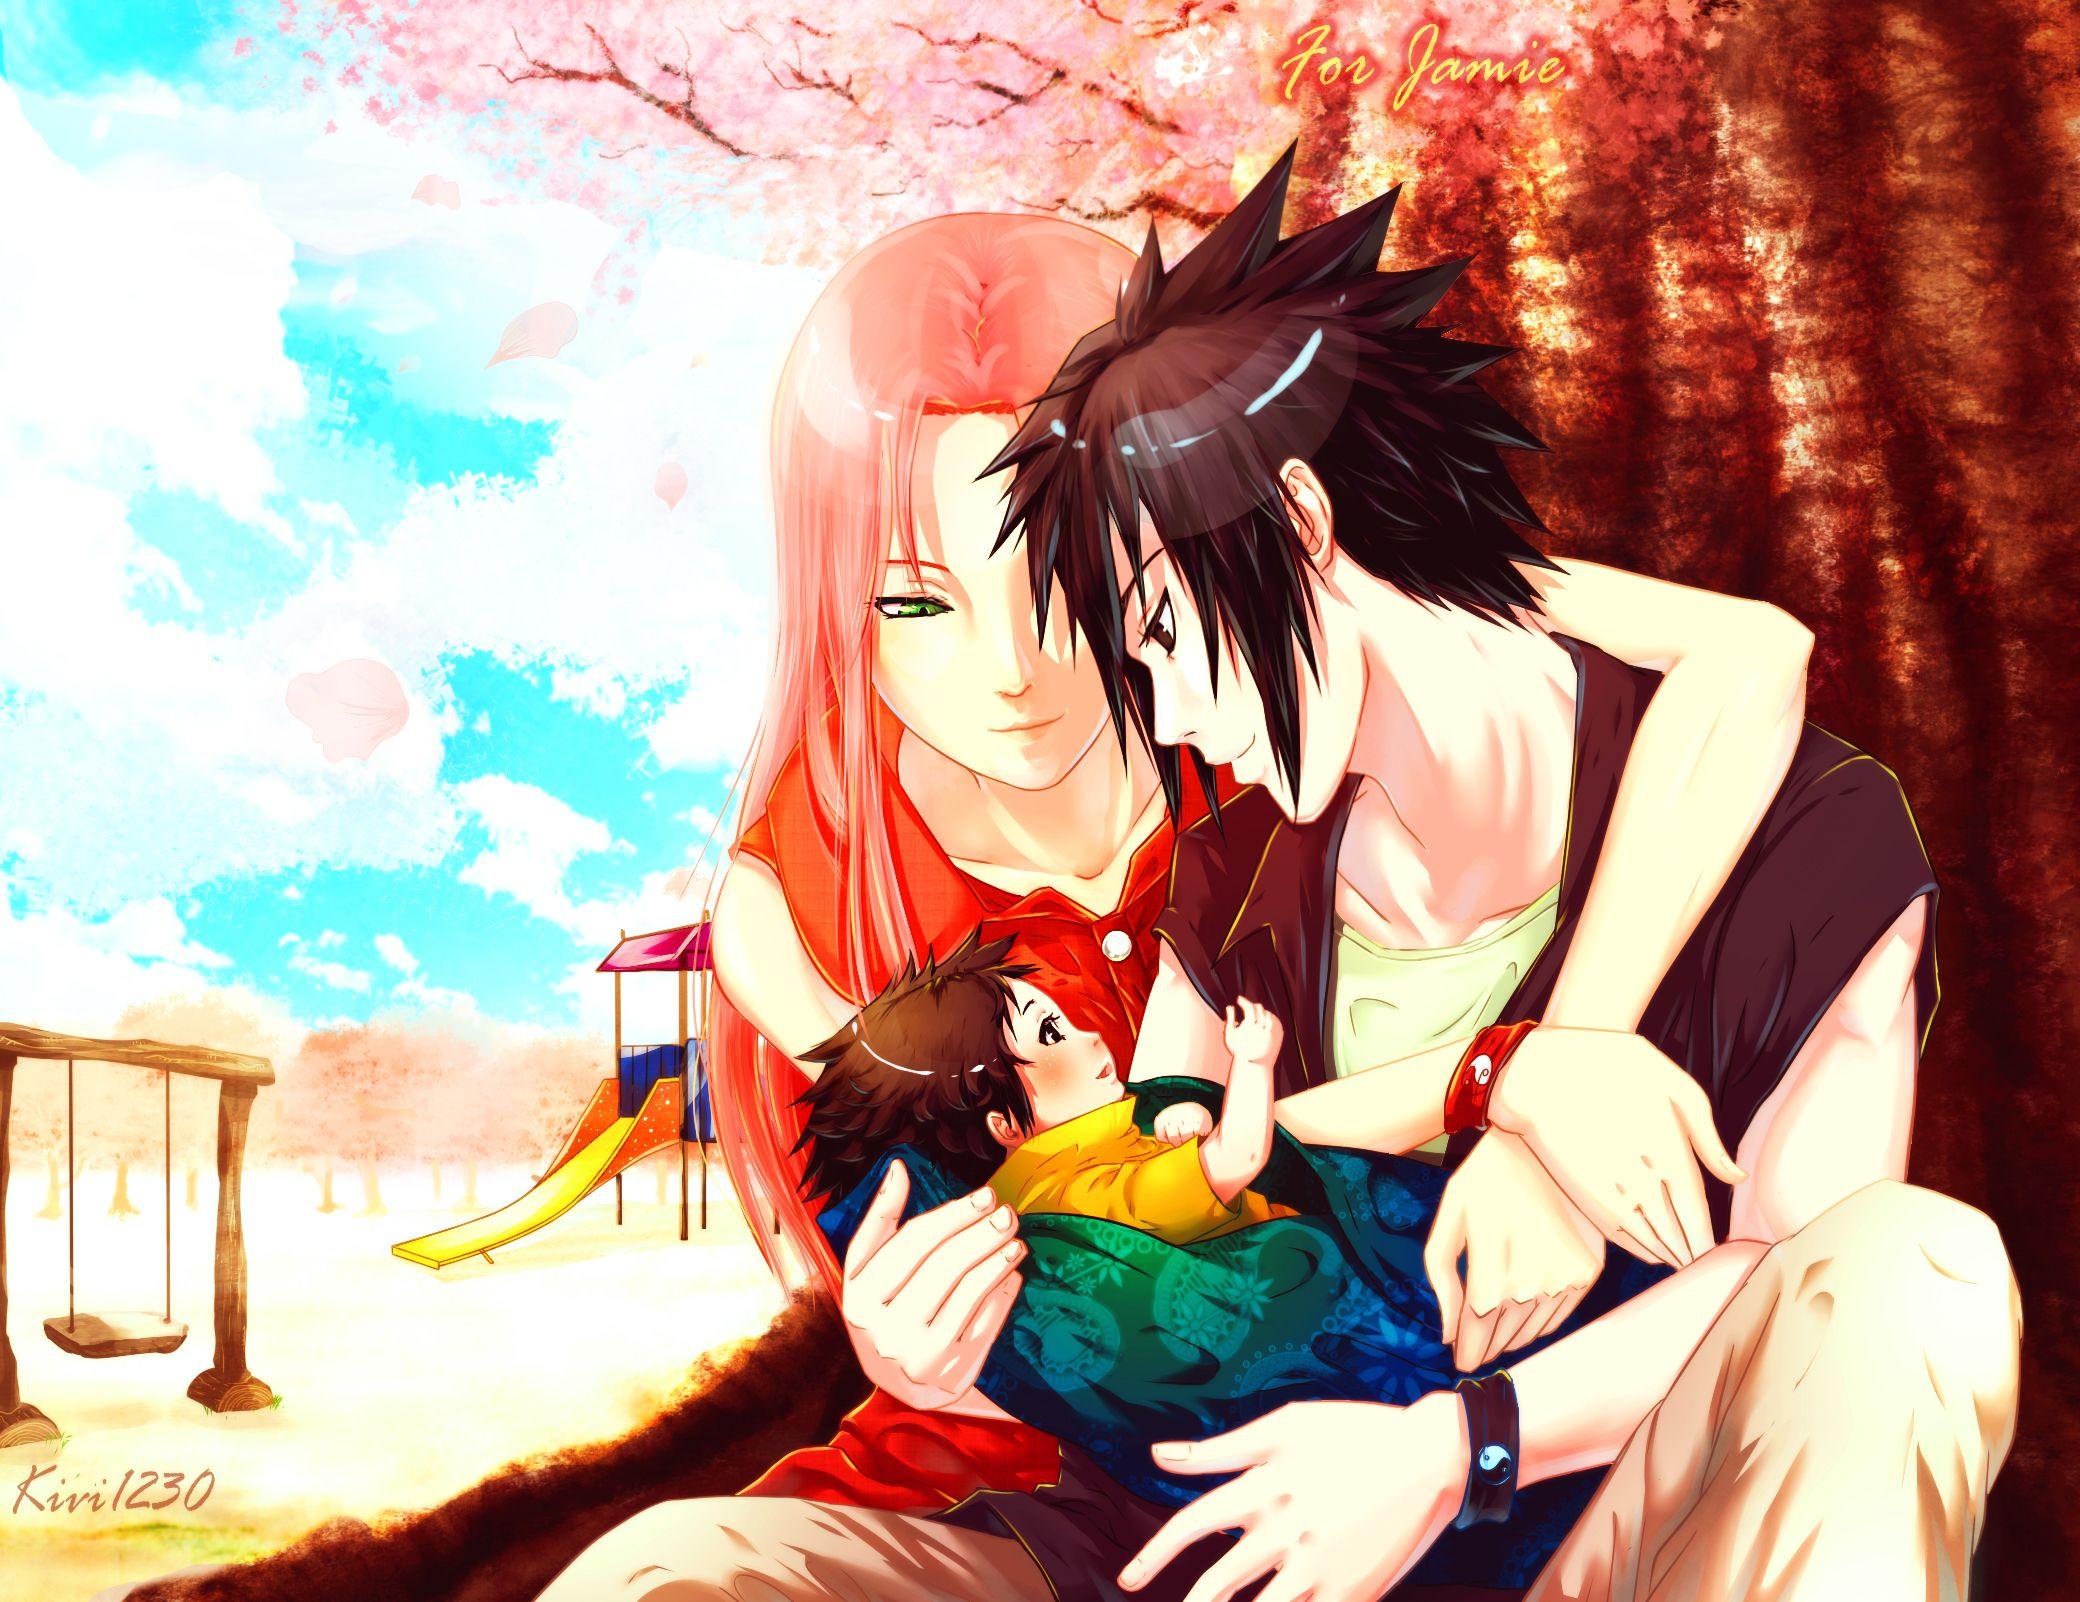 Fantastic Wallpaper Naruto Love - 956f779cd1584075a9403e2432a71d57  Collection_35999.jpg